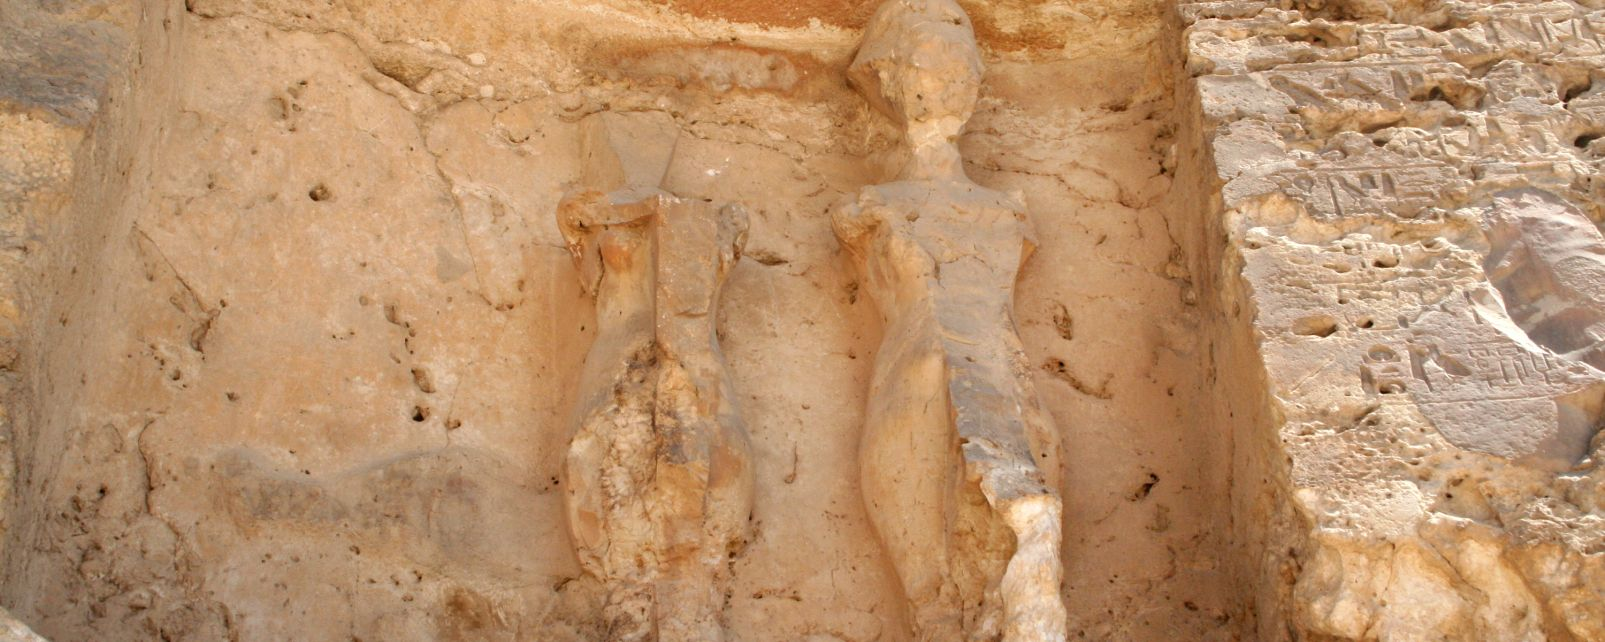 Les sites, Armana, egypte, moyen-orient, afrique, mythologie